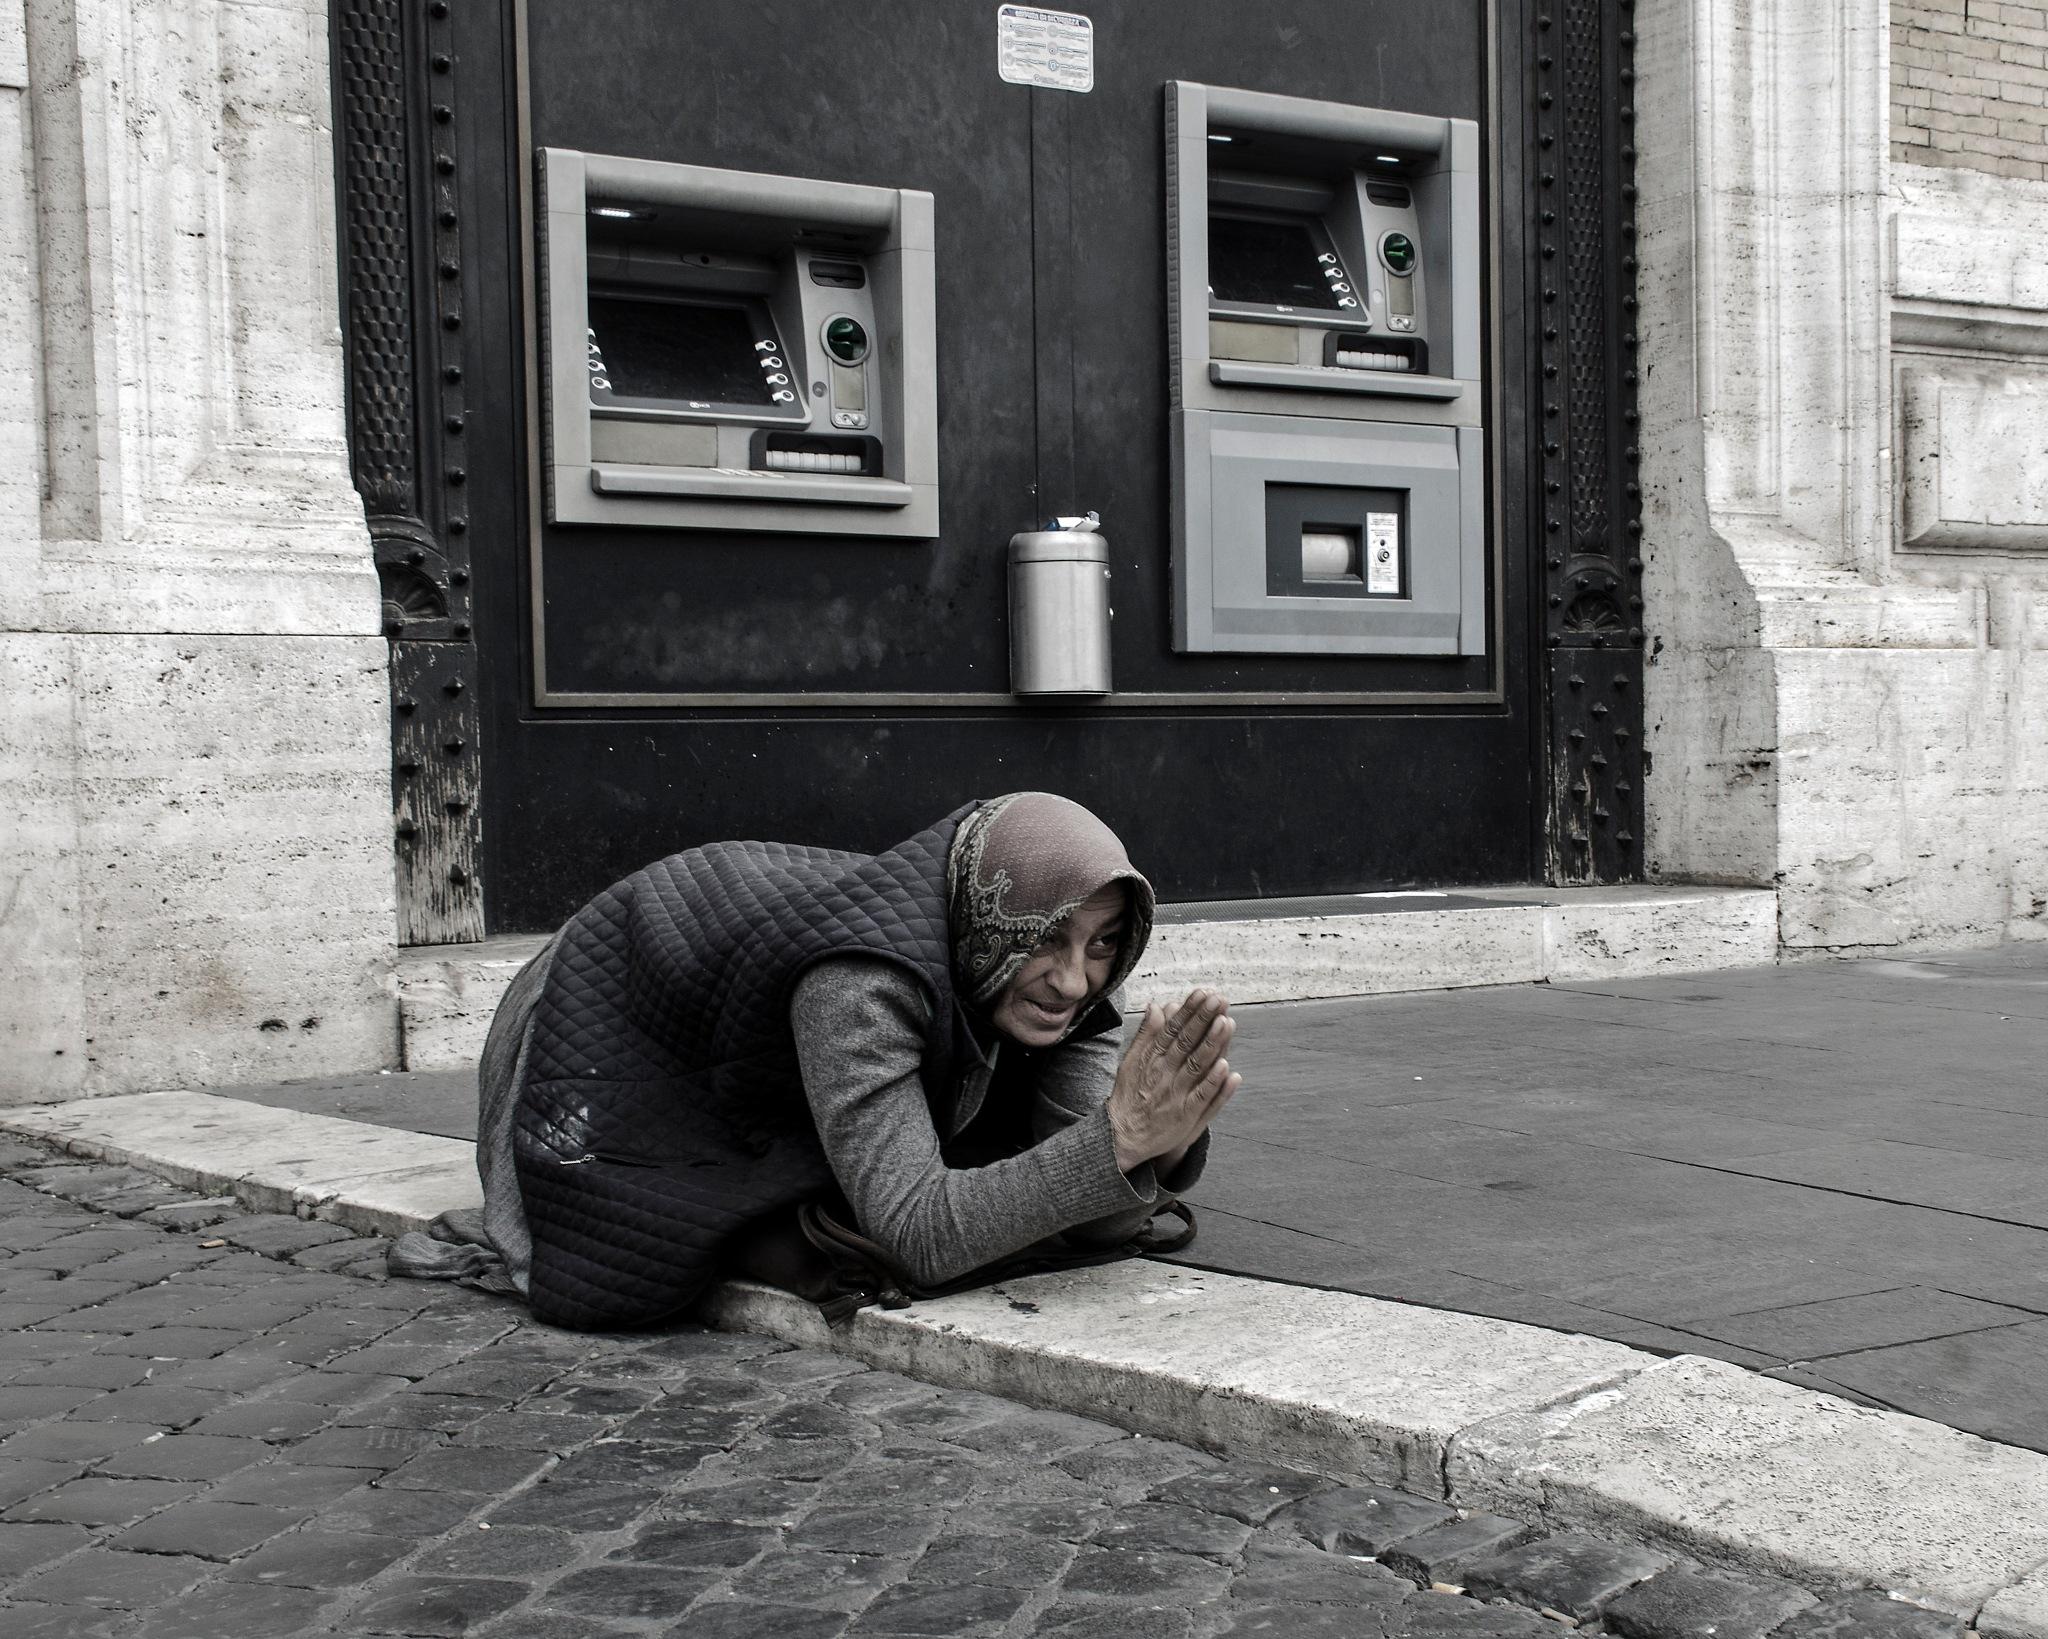 Contrast 2 by marokkyprianou